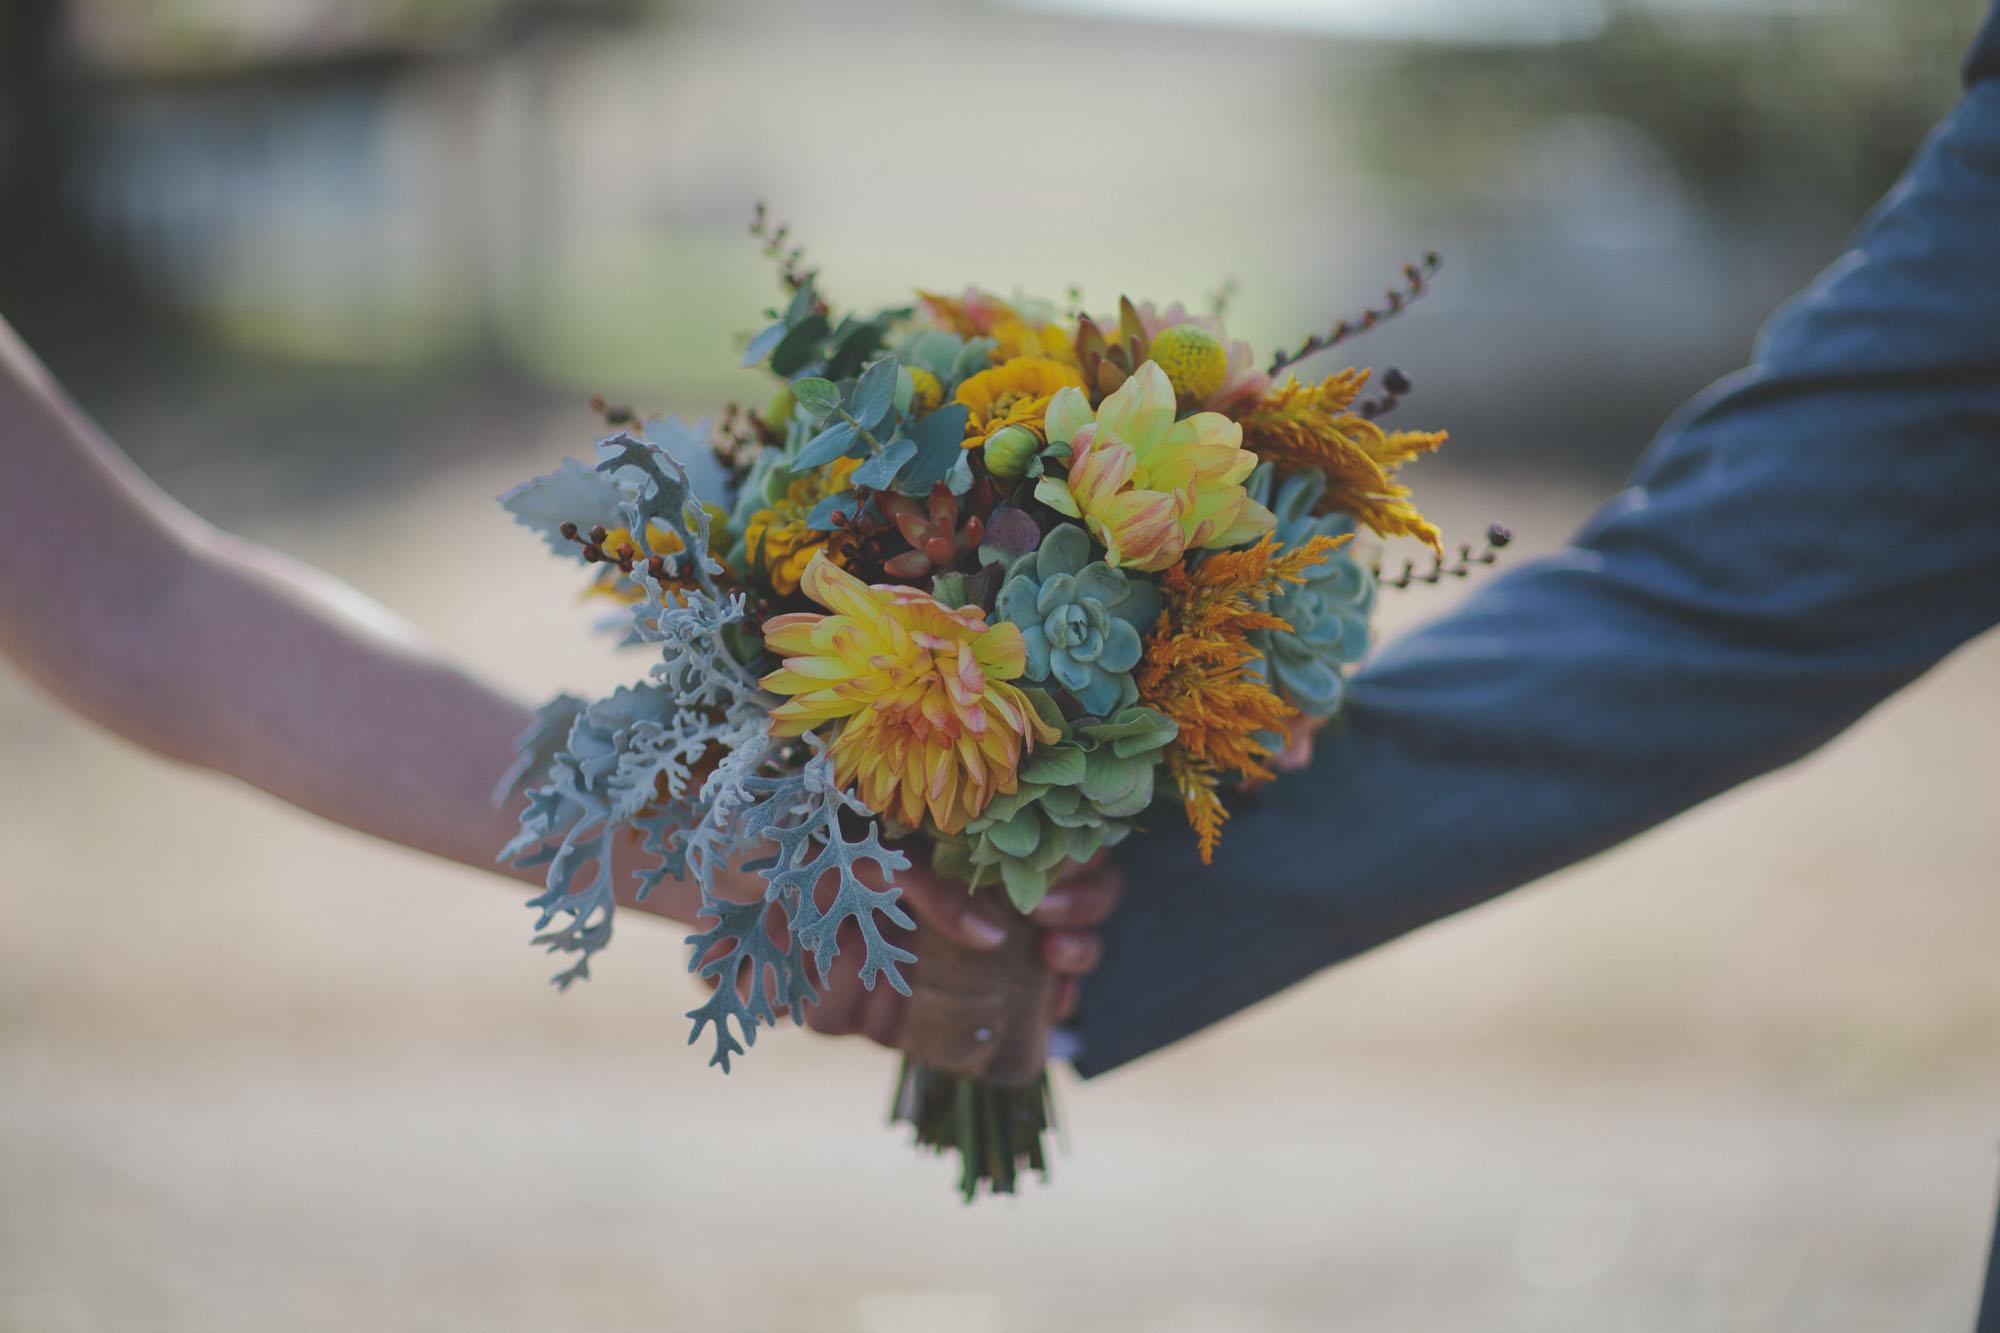 Gretchen_Gause_Petaluma_Olympias_Valley_Wedding_Photo-095.jpg